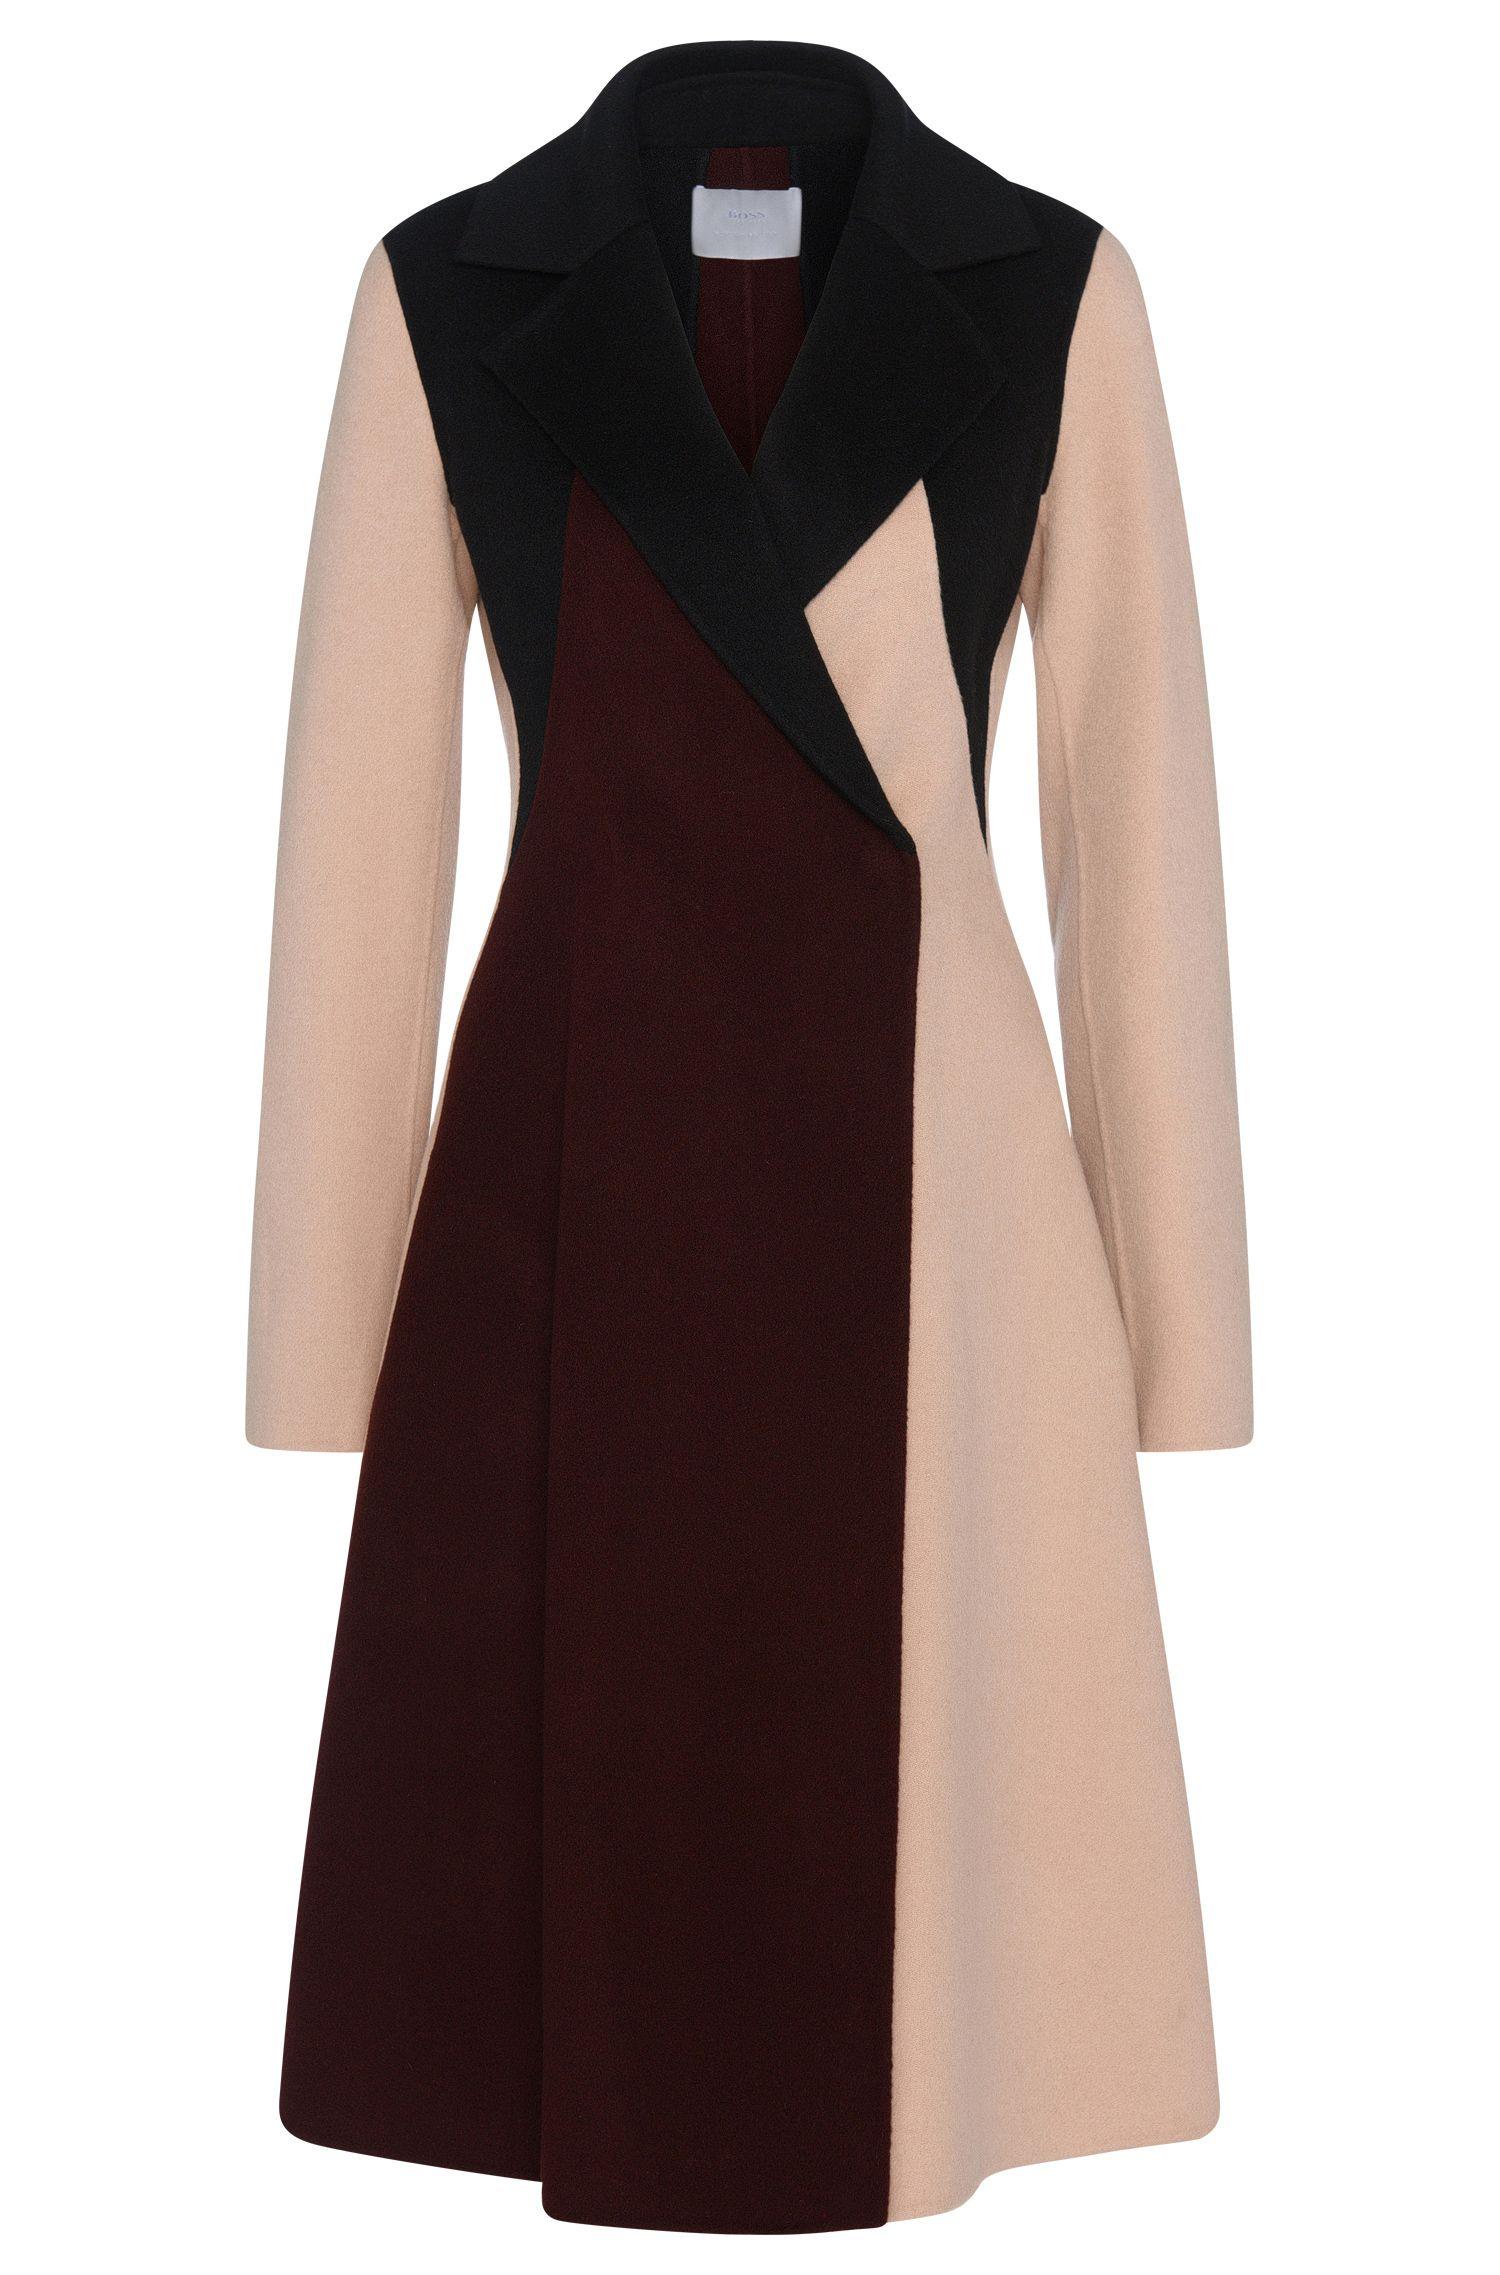 'FS_Cibina' | Wool Cashmere A-Line Coat